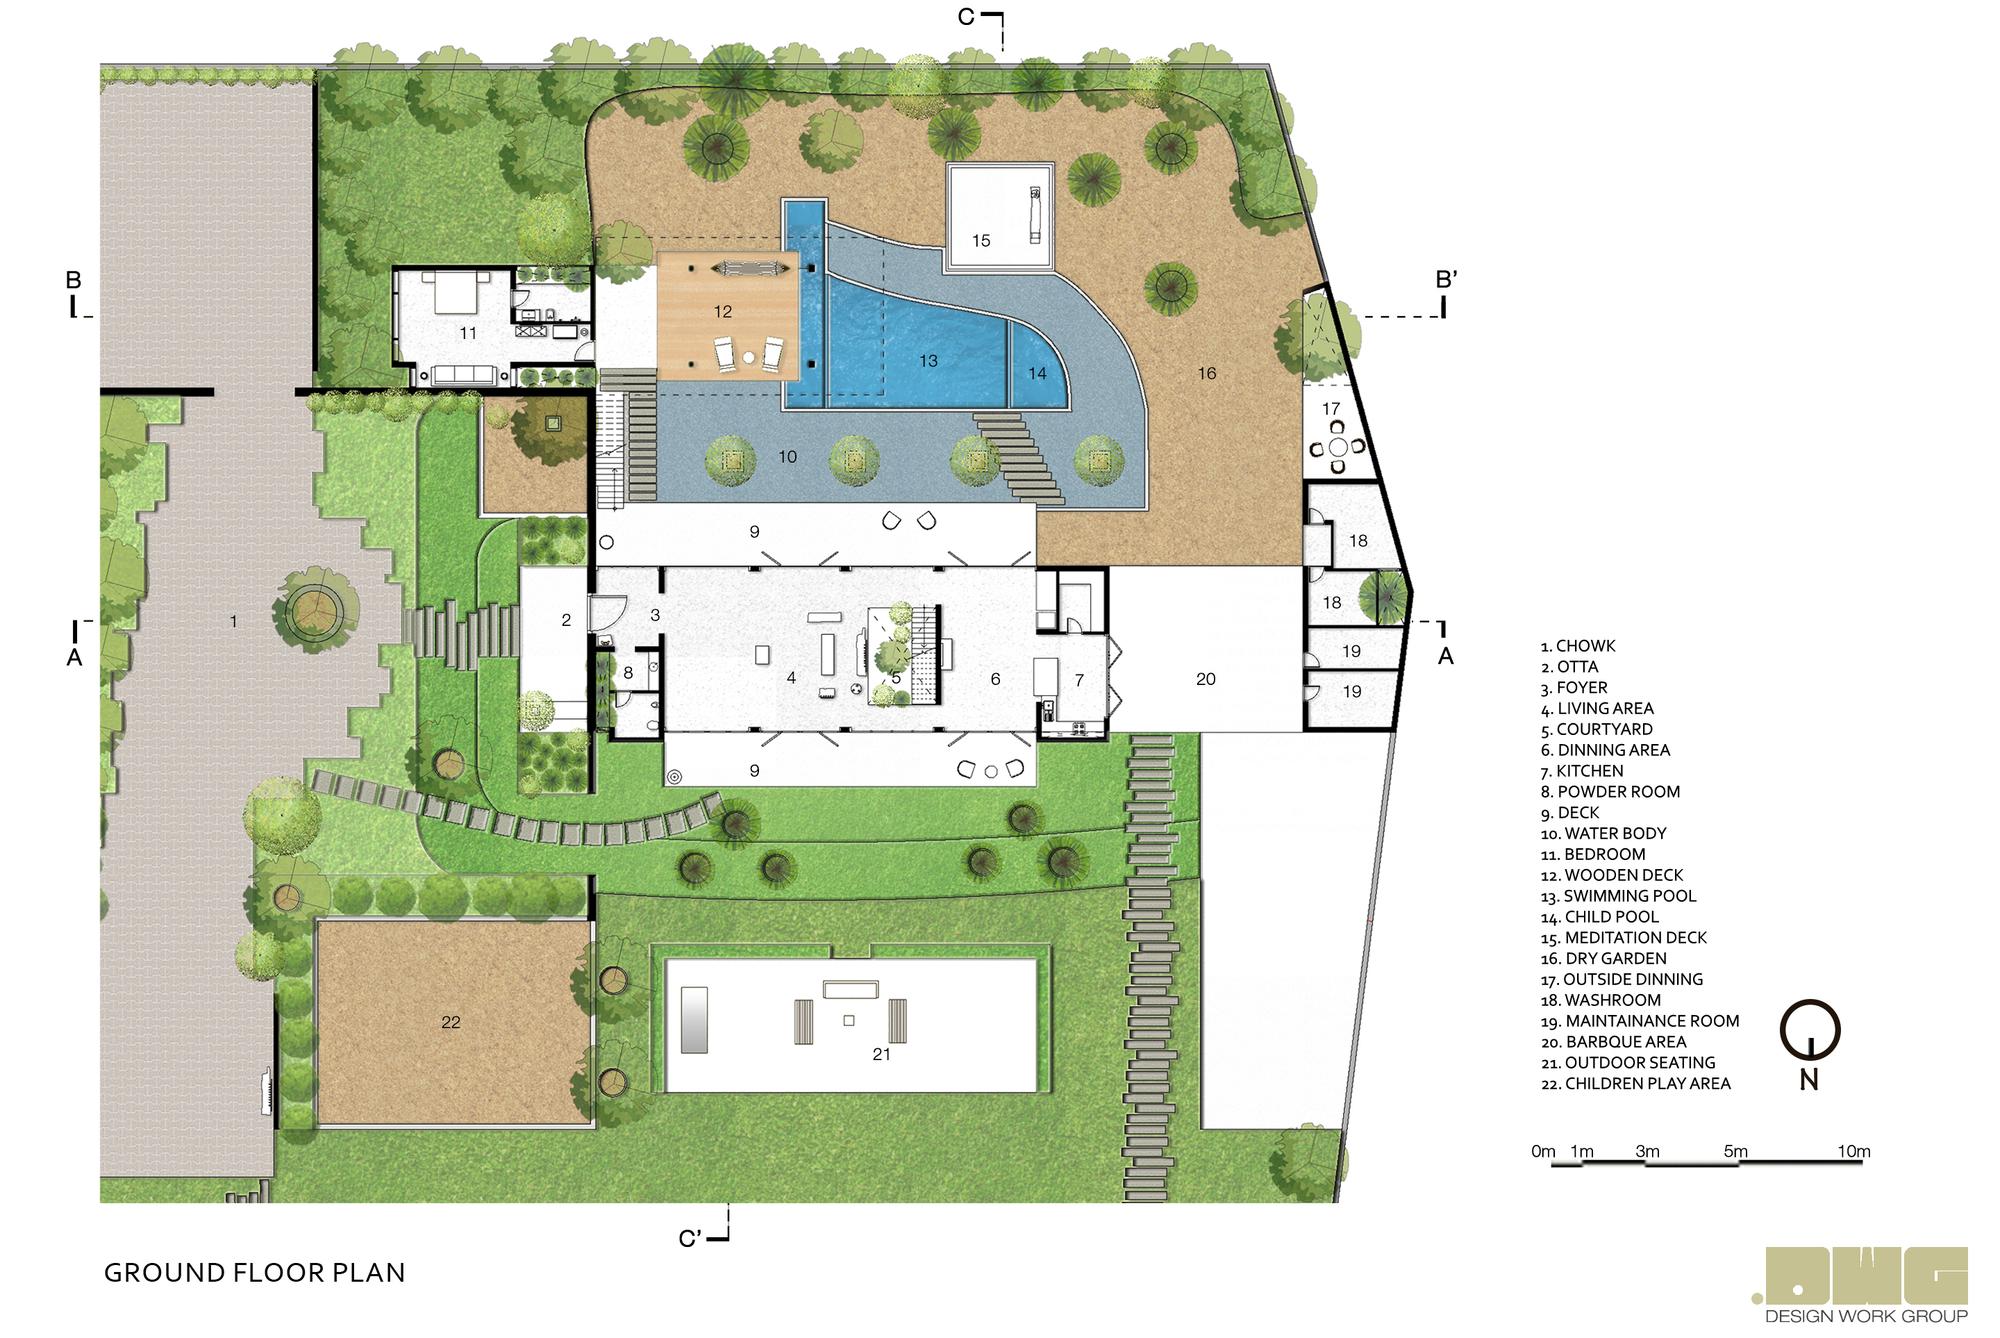 Childcare Floor Plans Gallery Of Vanvaaso Design Work Group 23